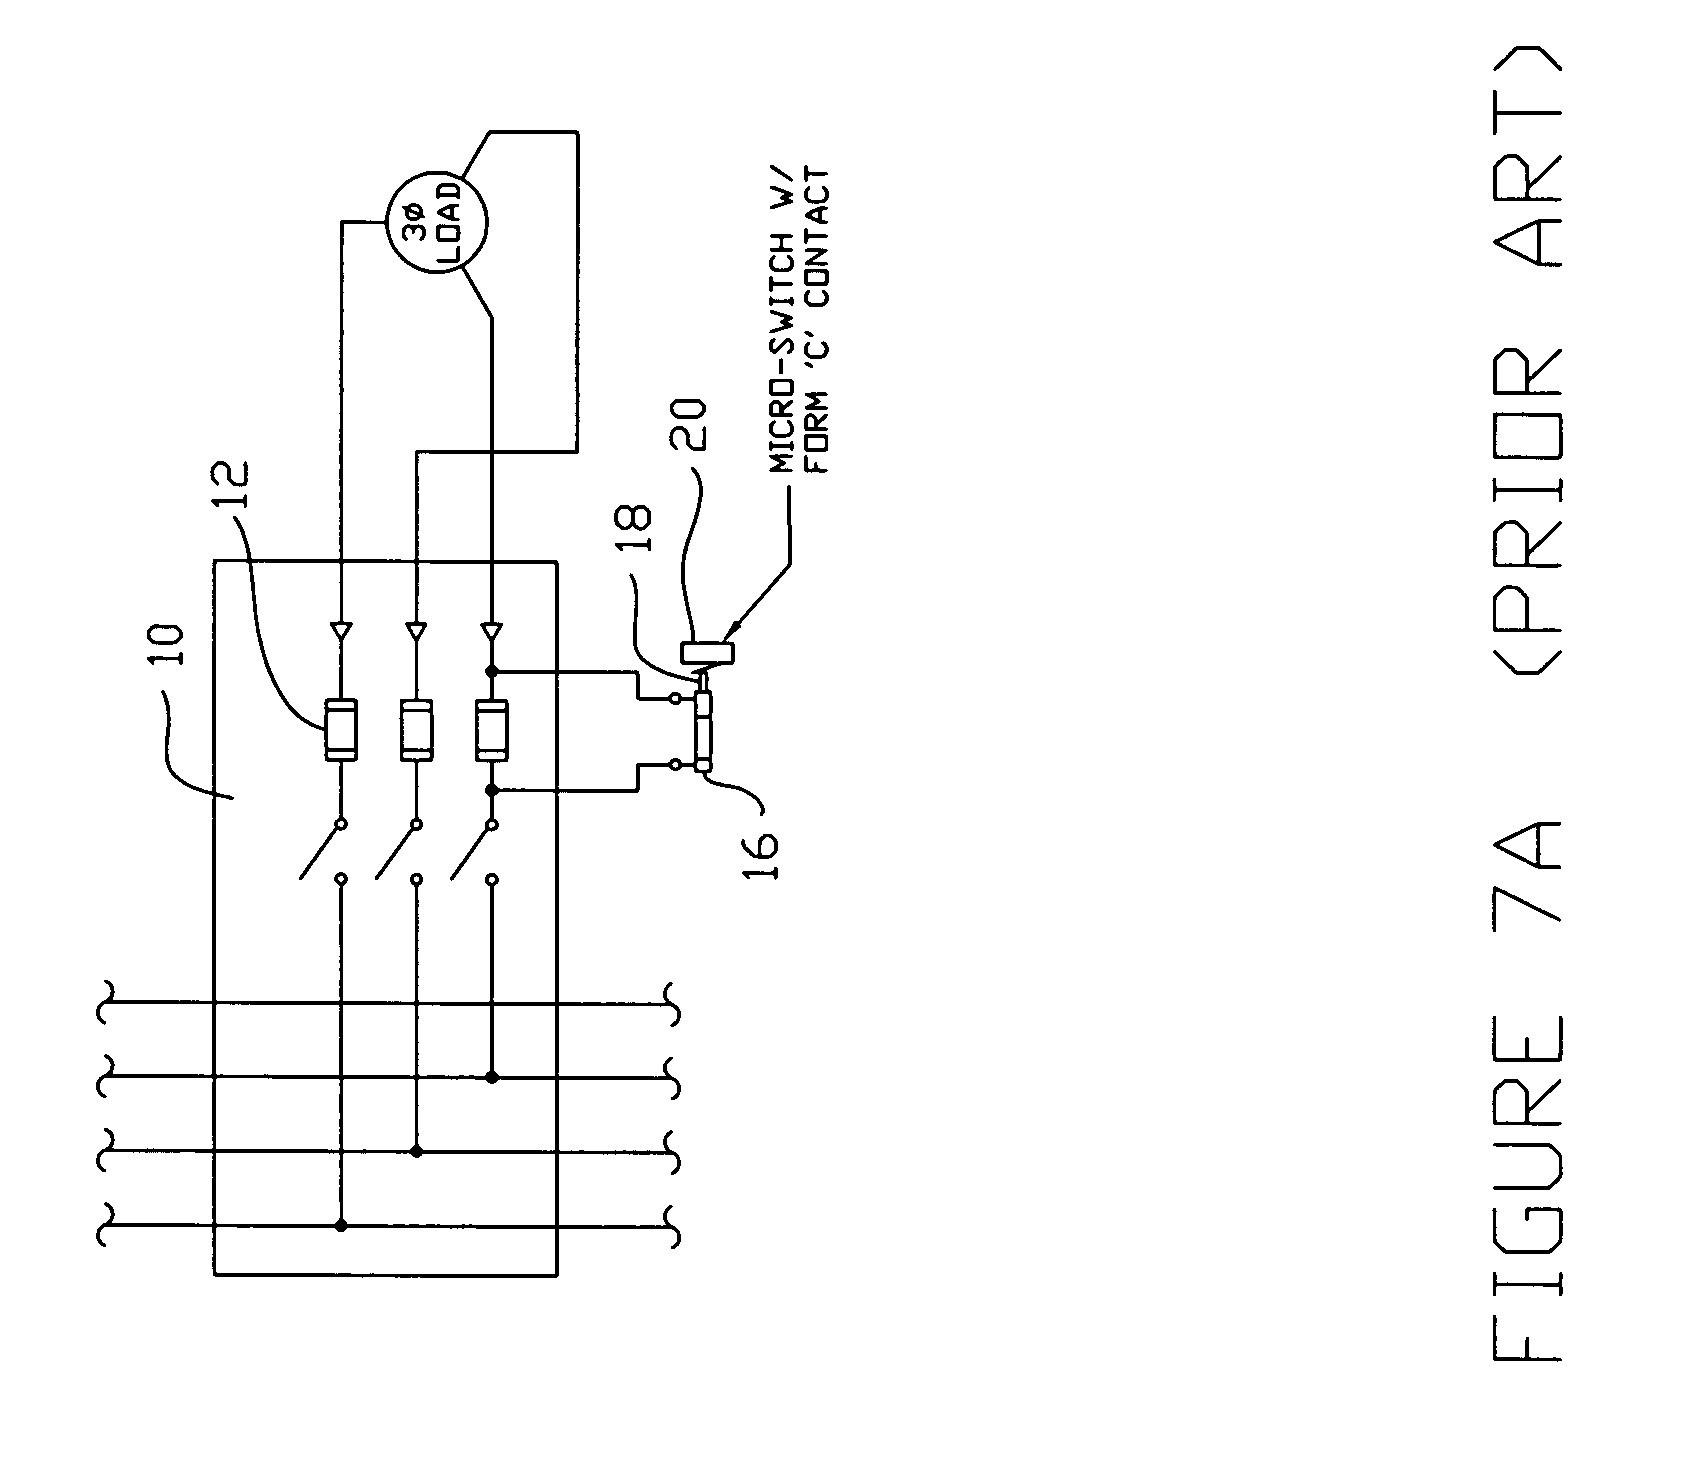 hight resolution of square d 8903 lighting contactor wiring diagram wirings diagramsquare d lighting contactor wiring diagram 8903 wiring